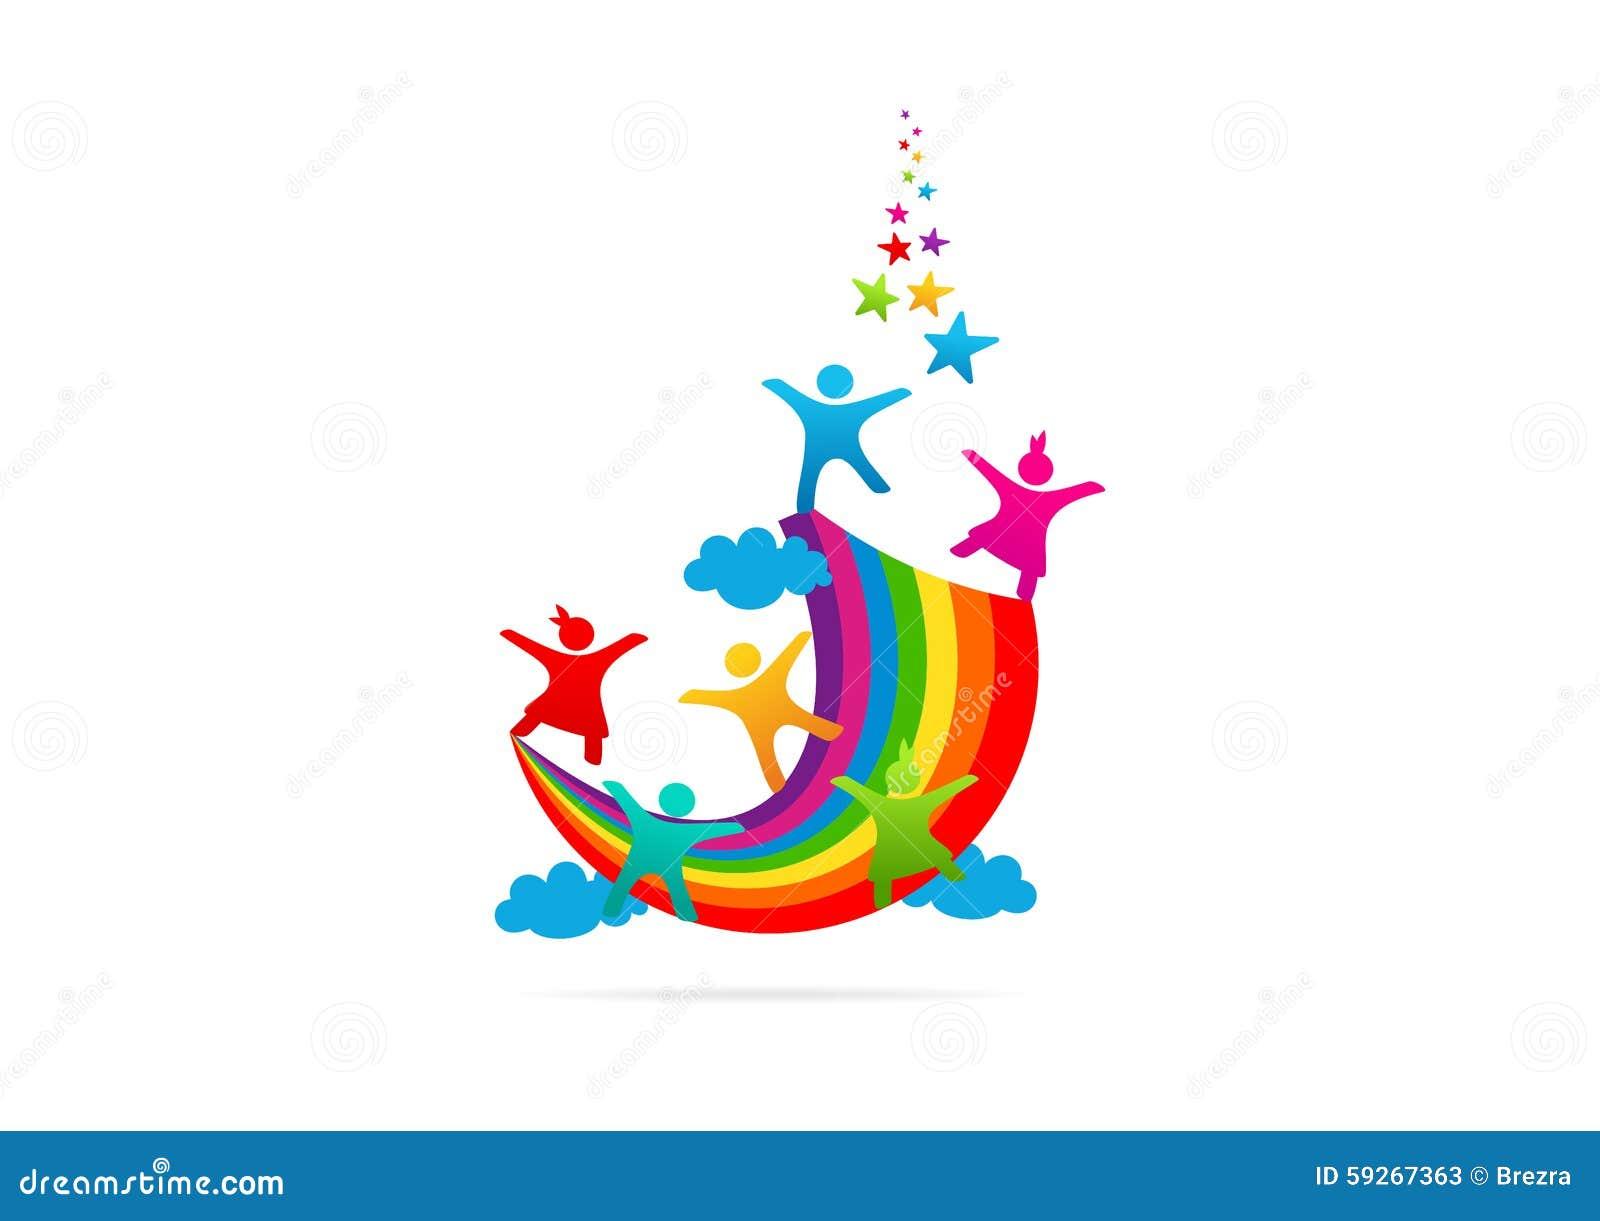 Children Playing On The Rainbow Imagination Vector Logo